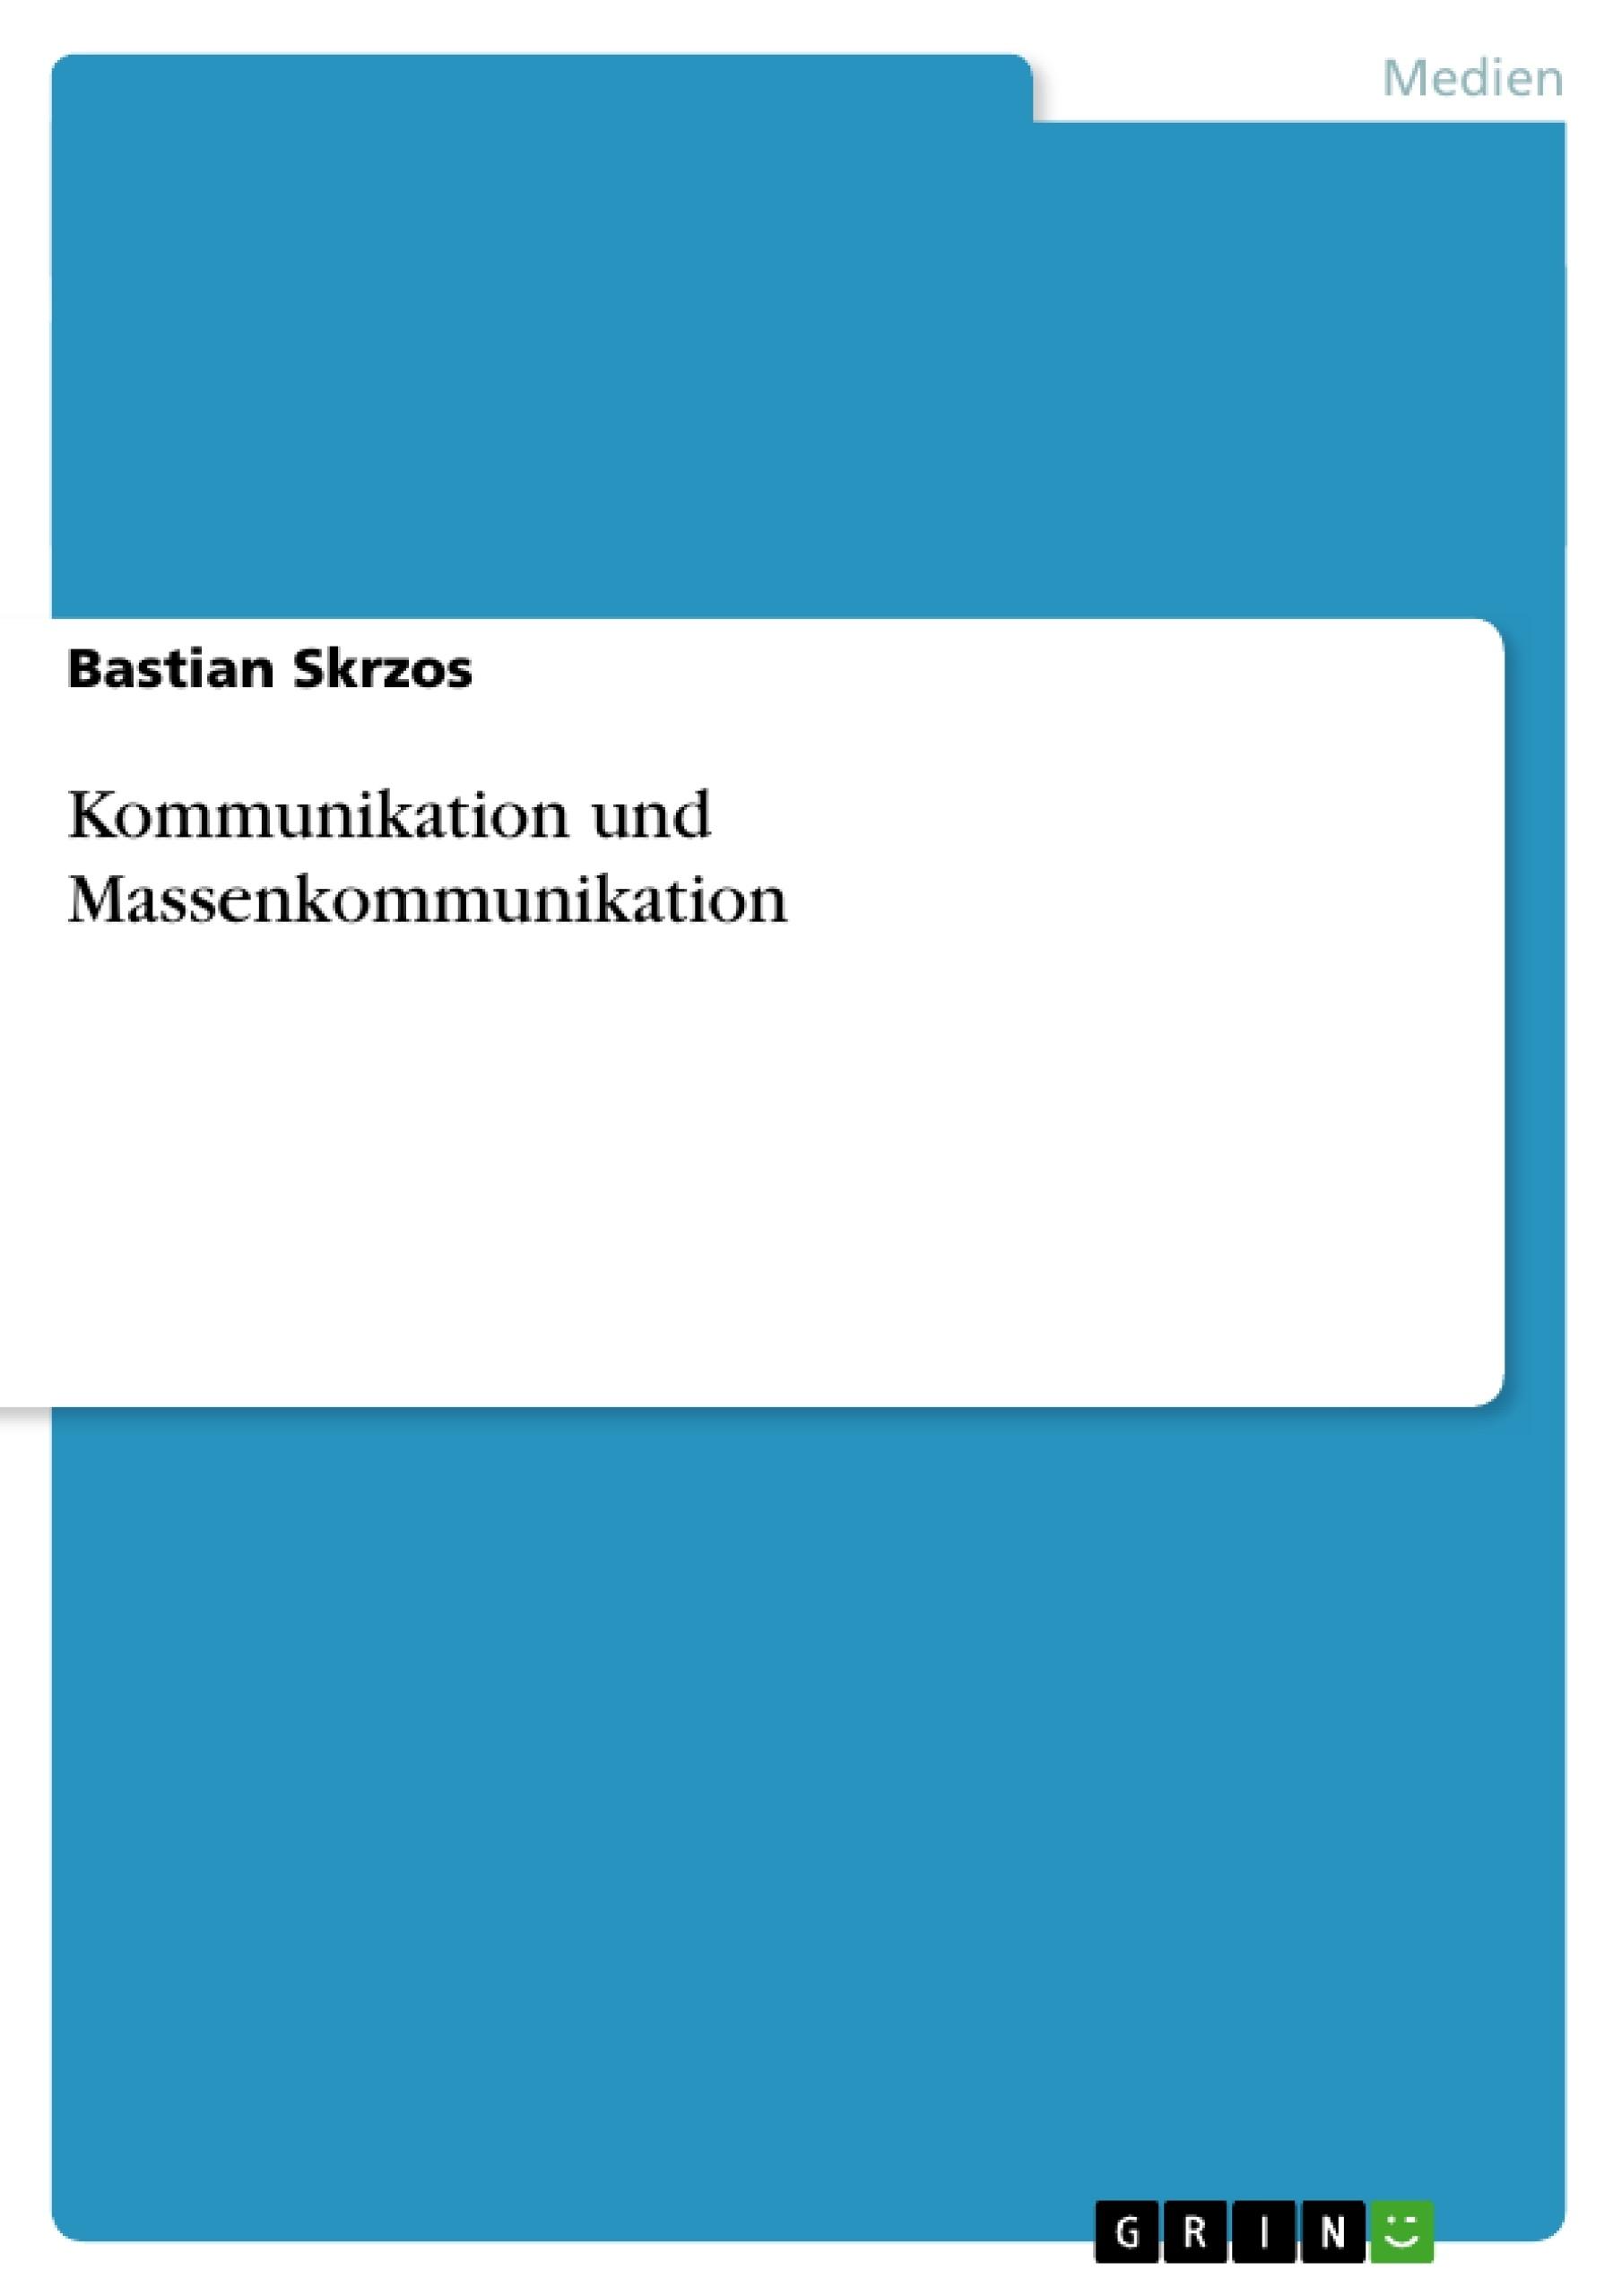 Titel: Kommunikation und Massenkommunikation